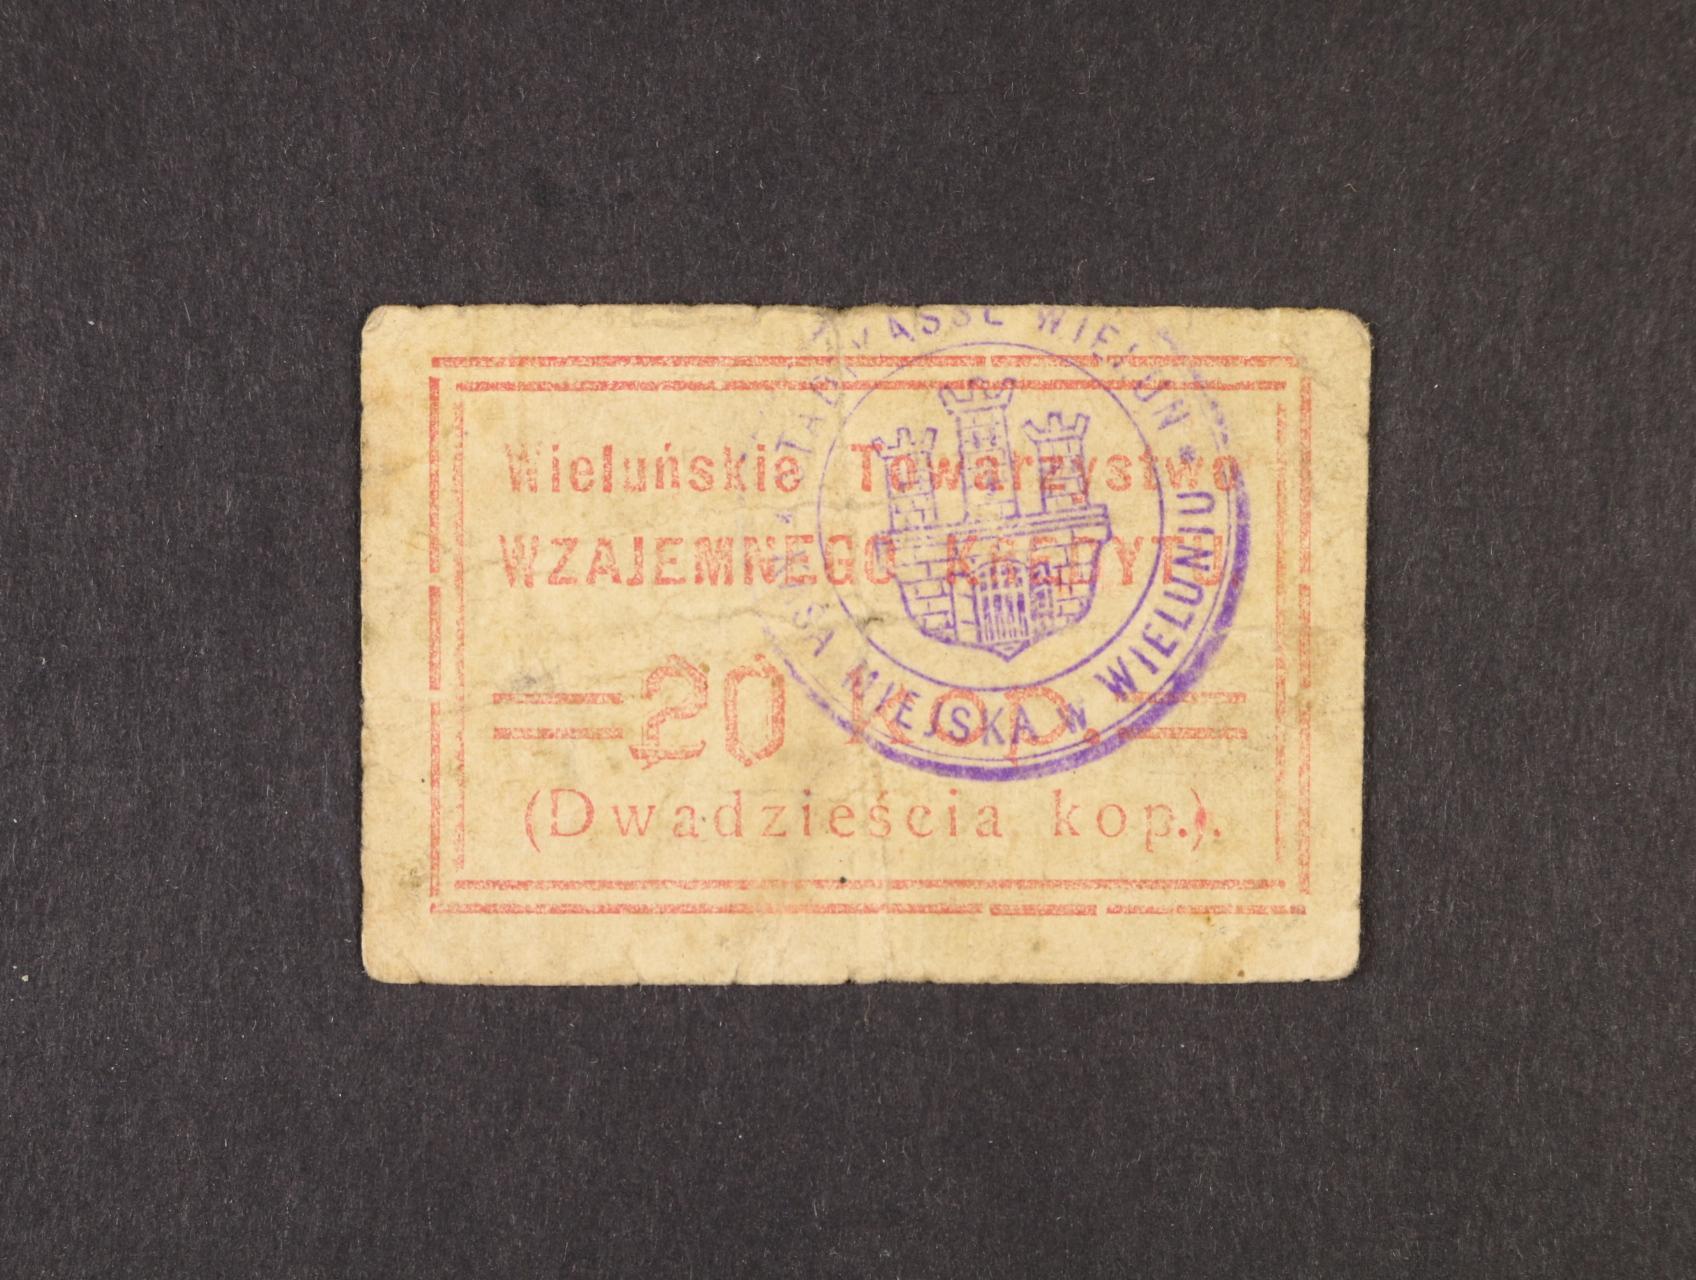 Wielun, 20 kop. b.d. Community of Mutual Credit, Rj. R-26752